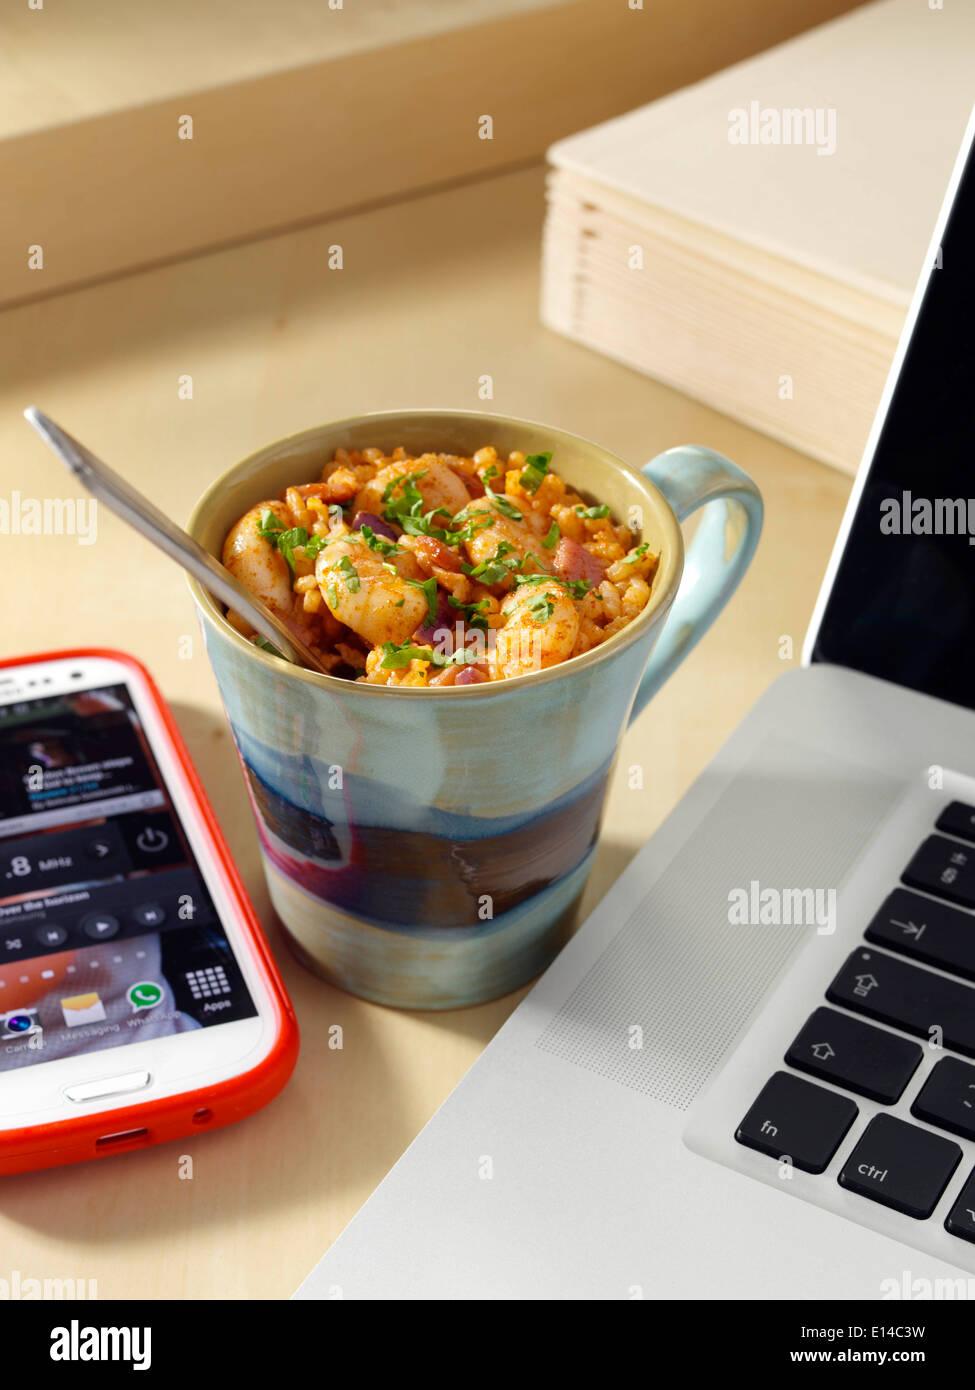 Prawn pilau microwaved in a mug - Stock Image